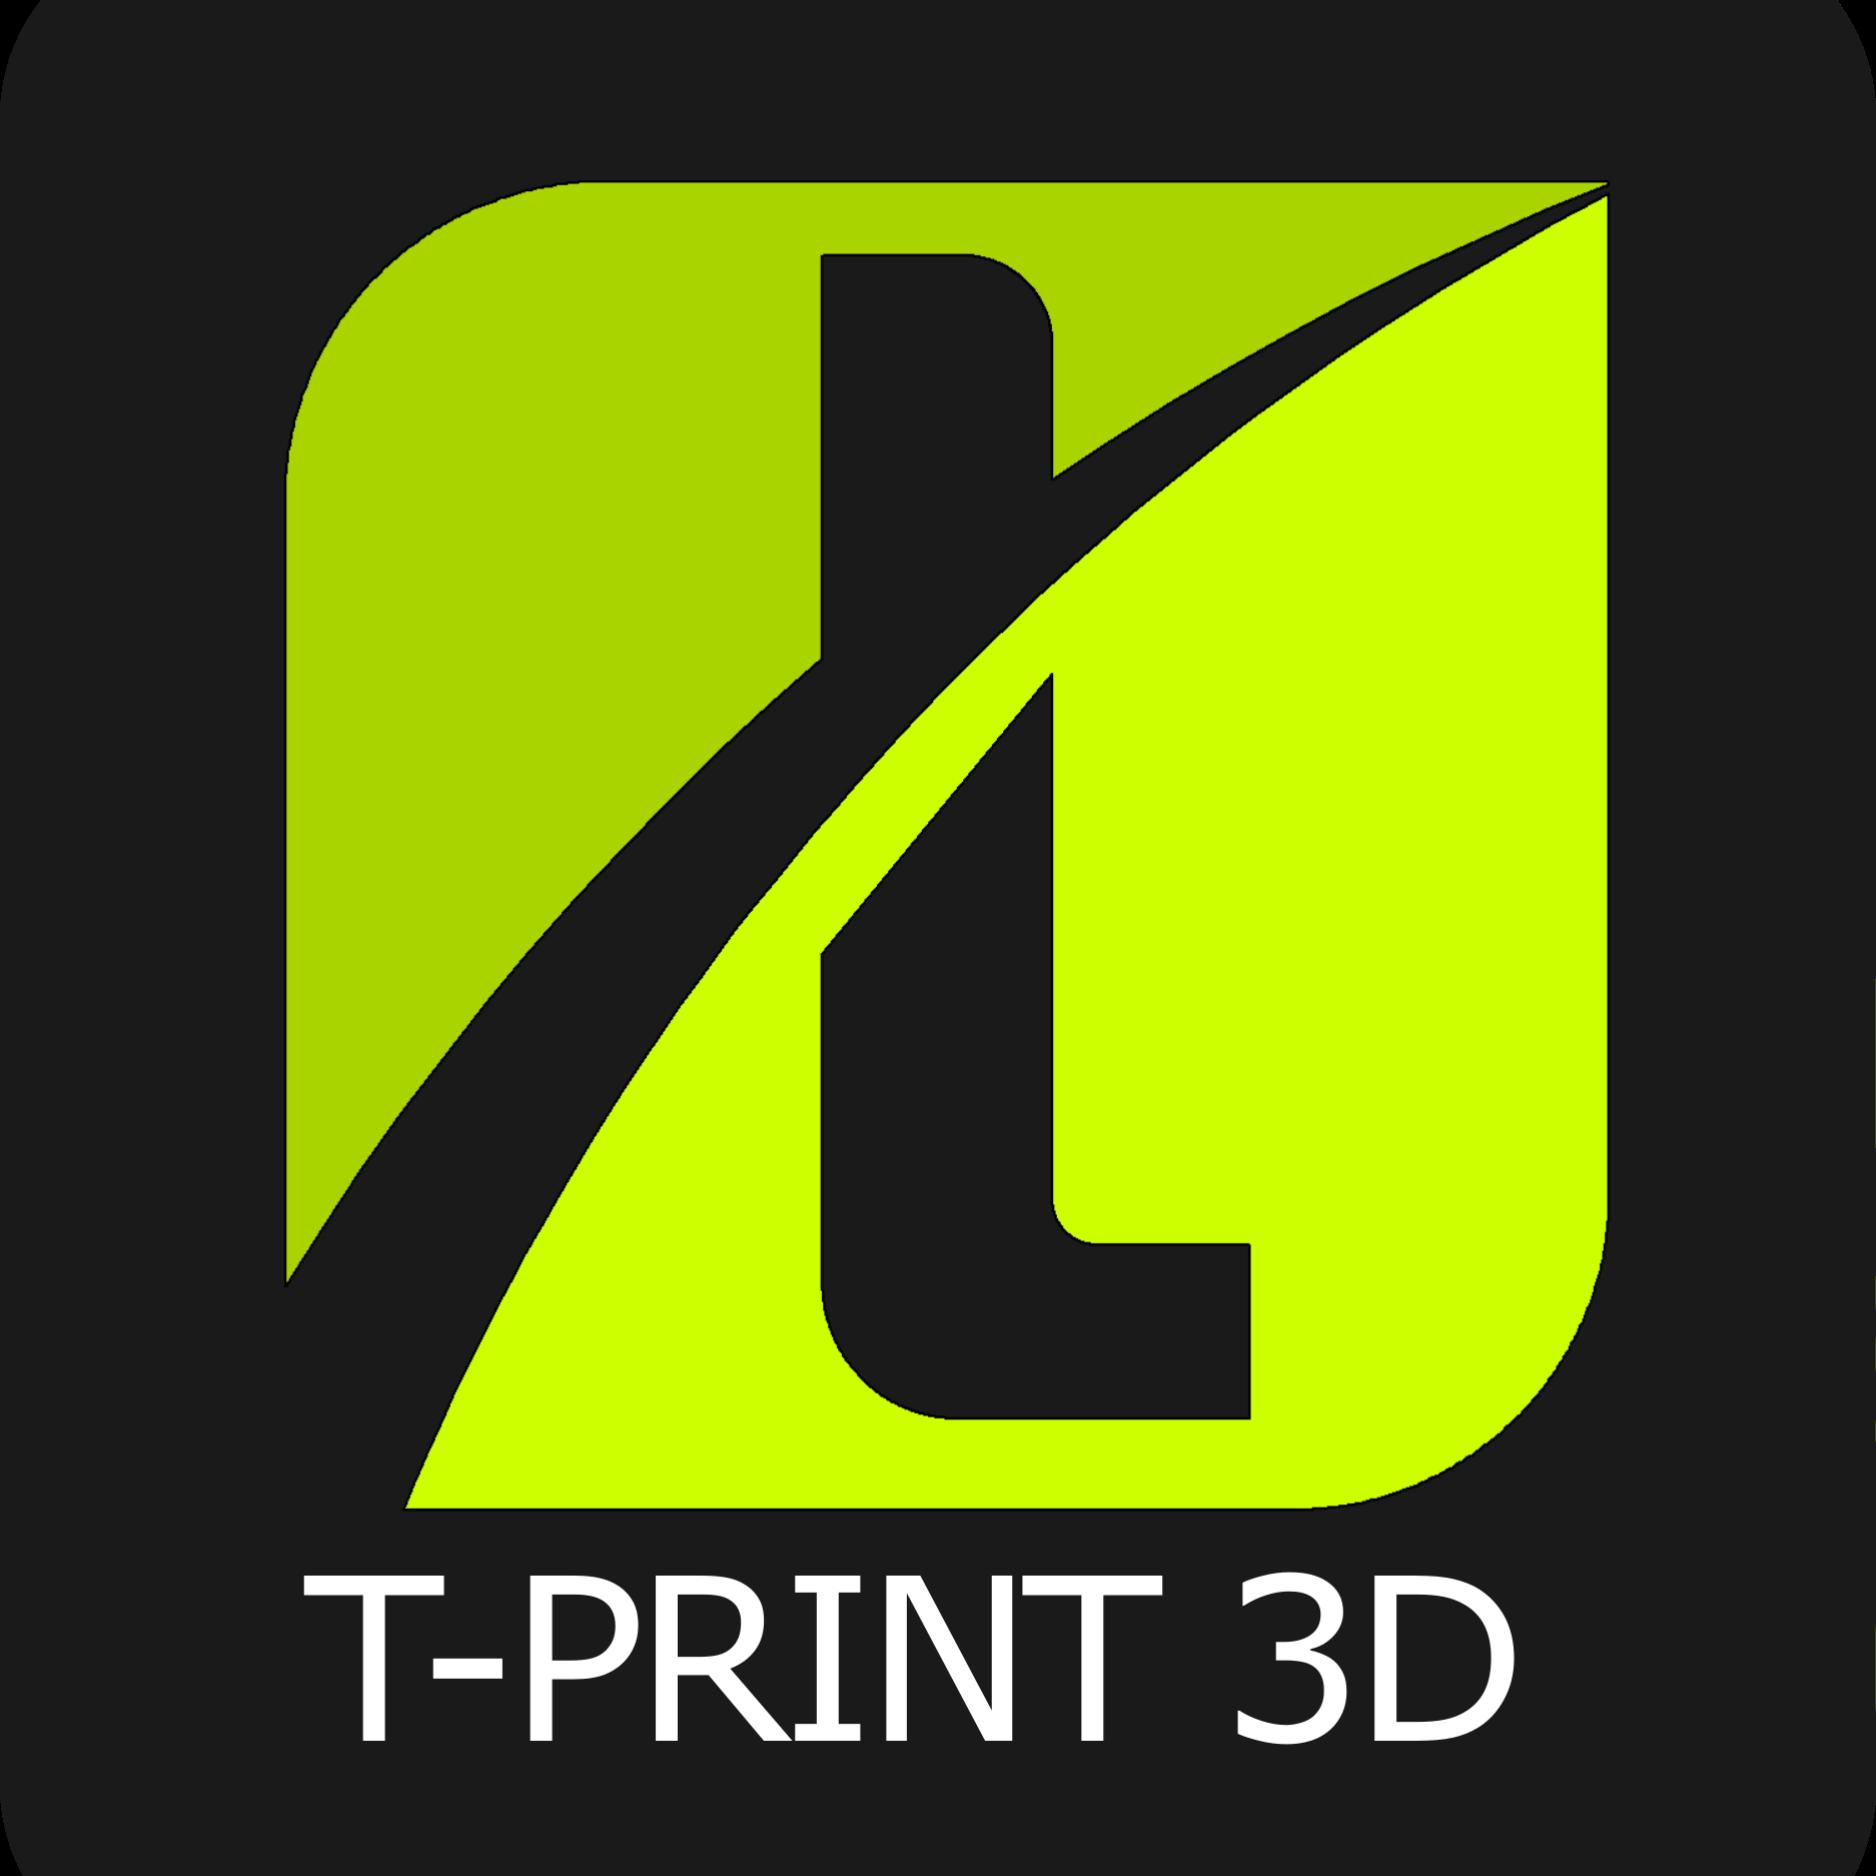 T-Print 3D